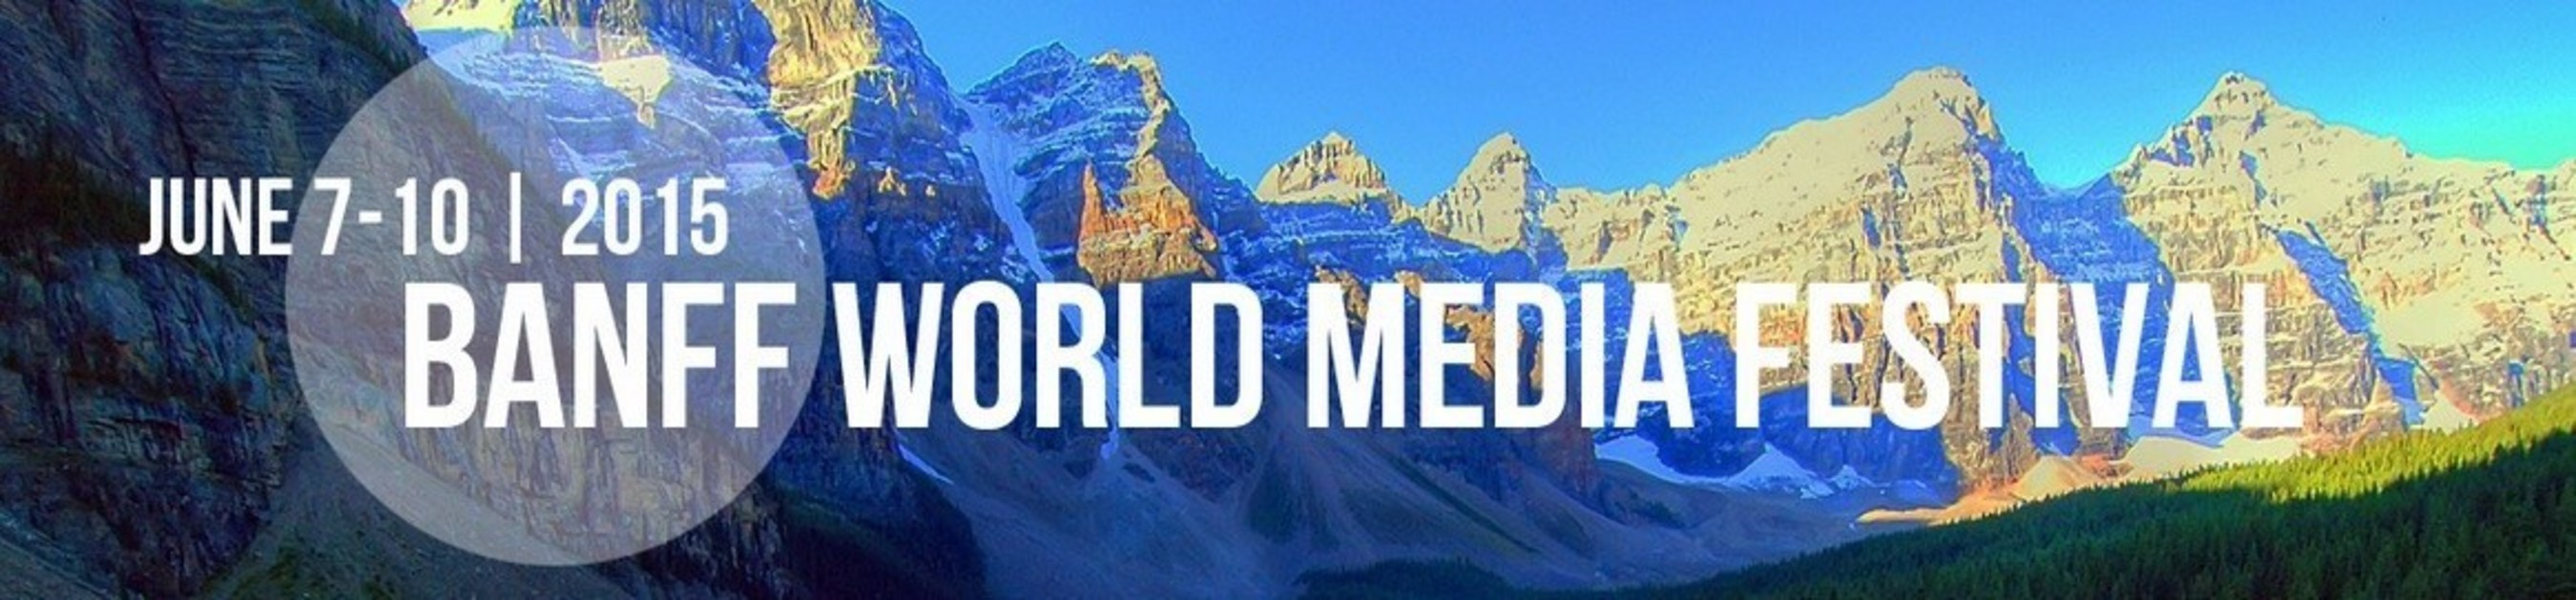 A + E Networks President & CEO Nancy Dubuc to Present Opening Keynote at 2015 Banff World Media Festival